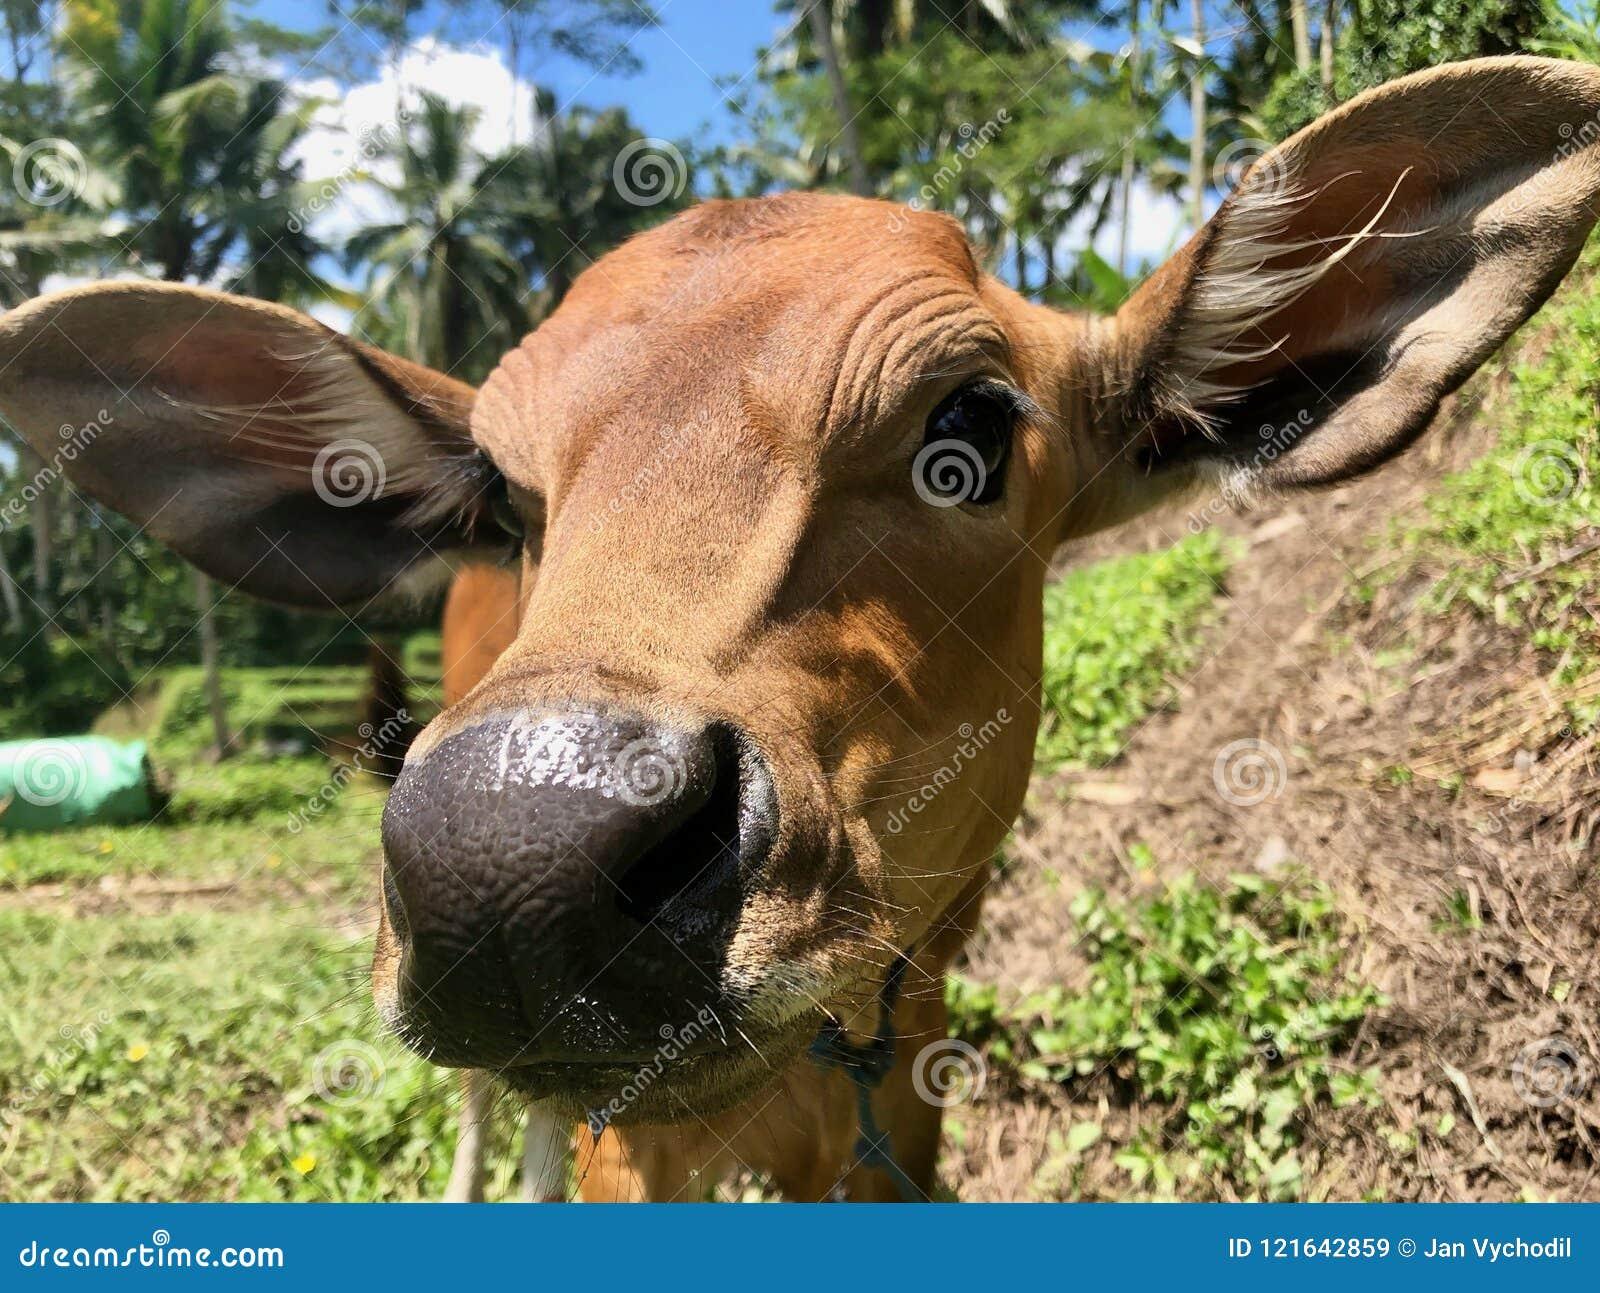 Hindu Cow In Bali Brown Baby Cow Detail Closeup Stock Image